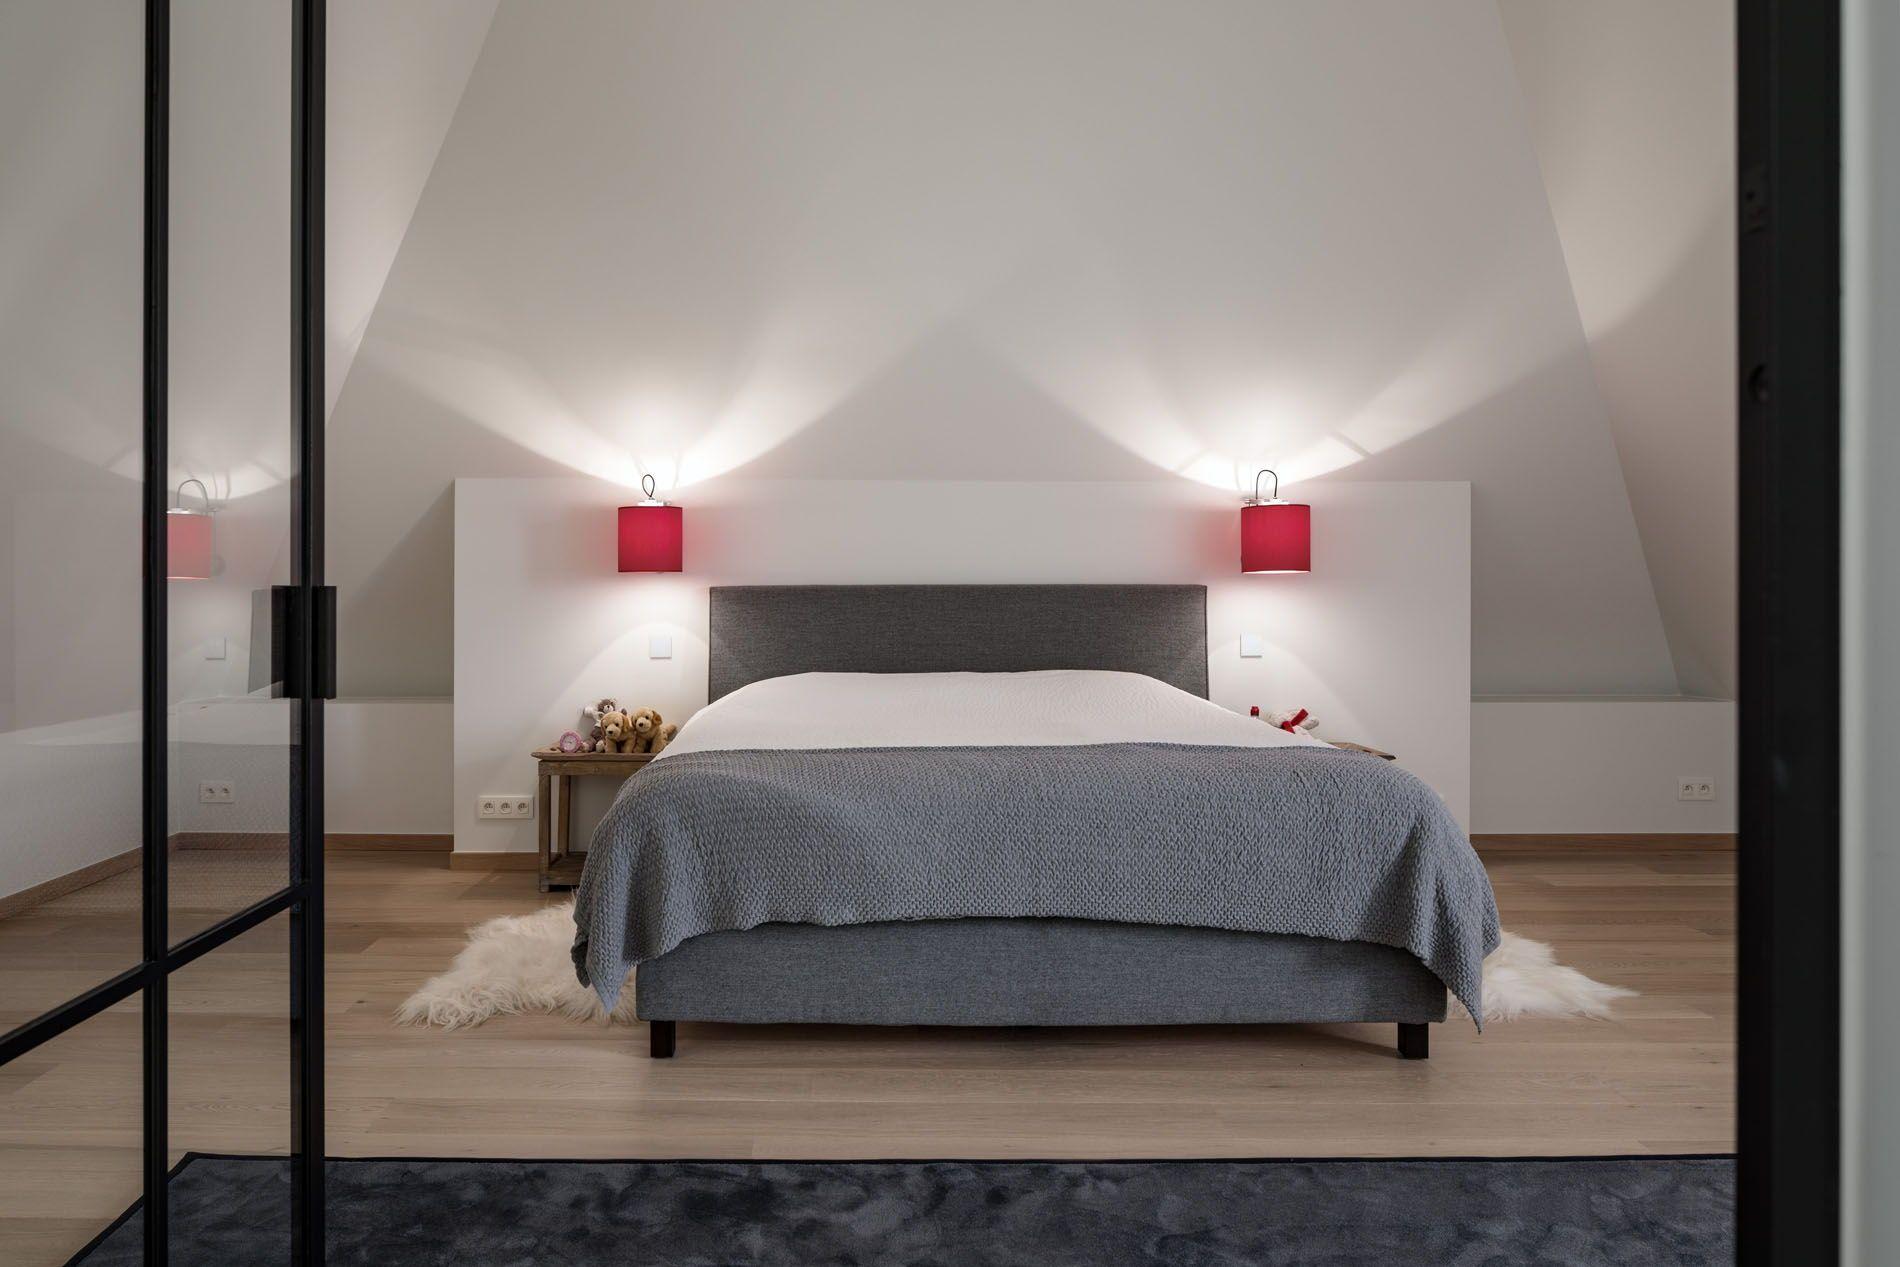 Bedroom Lighting Ideas Nomad Minimal In 2020 Bedroom Lighting Design Bedroom Design Bedroom Lighting